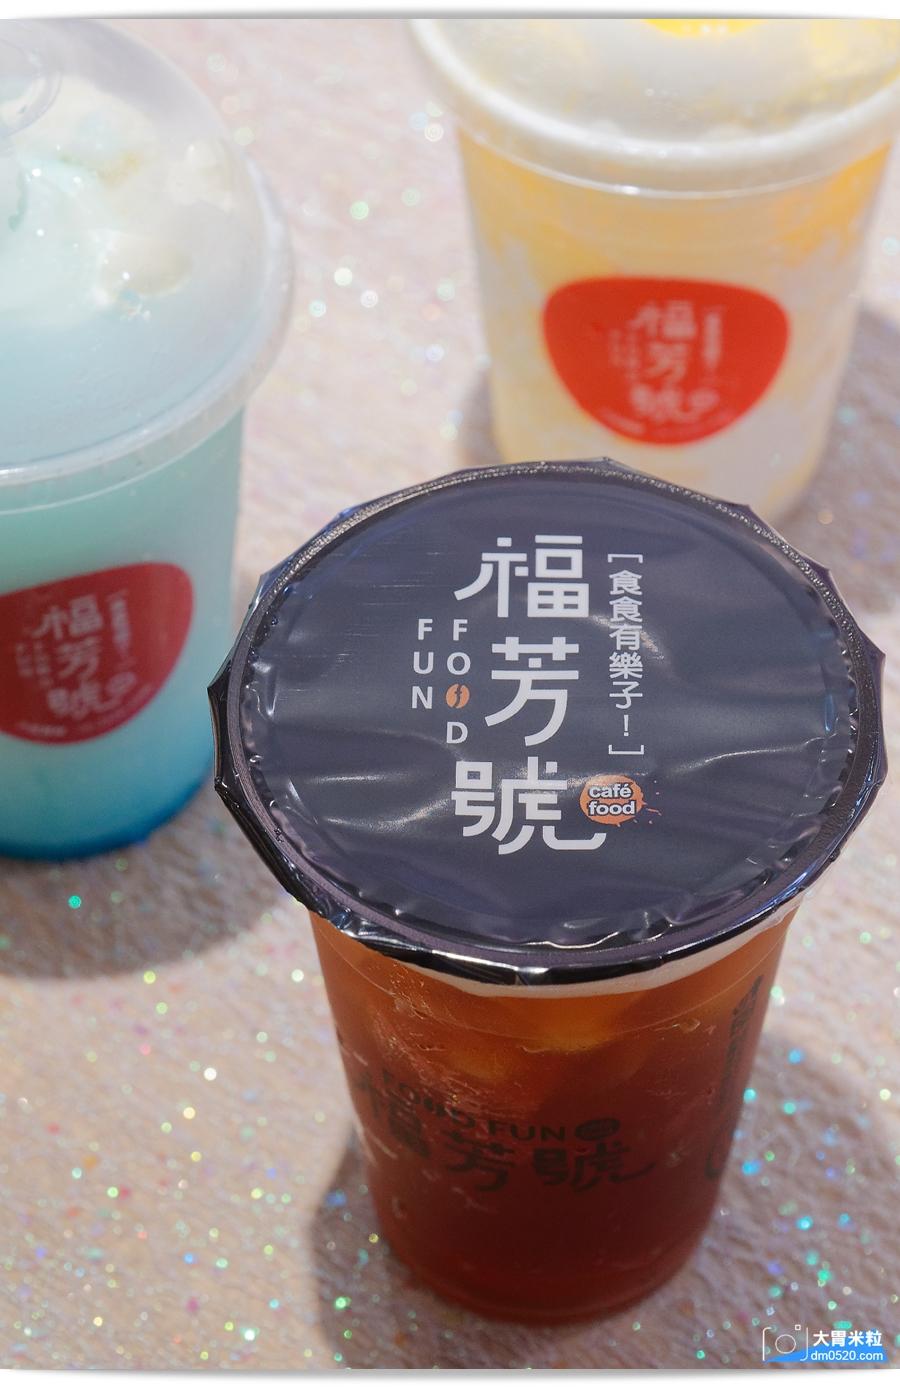 福芳號微風南山店